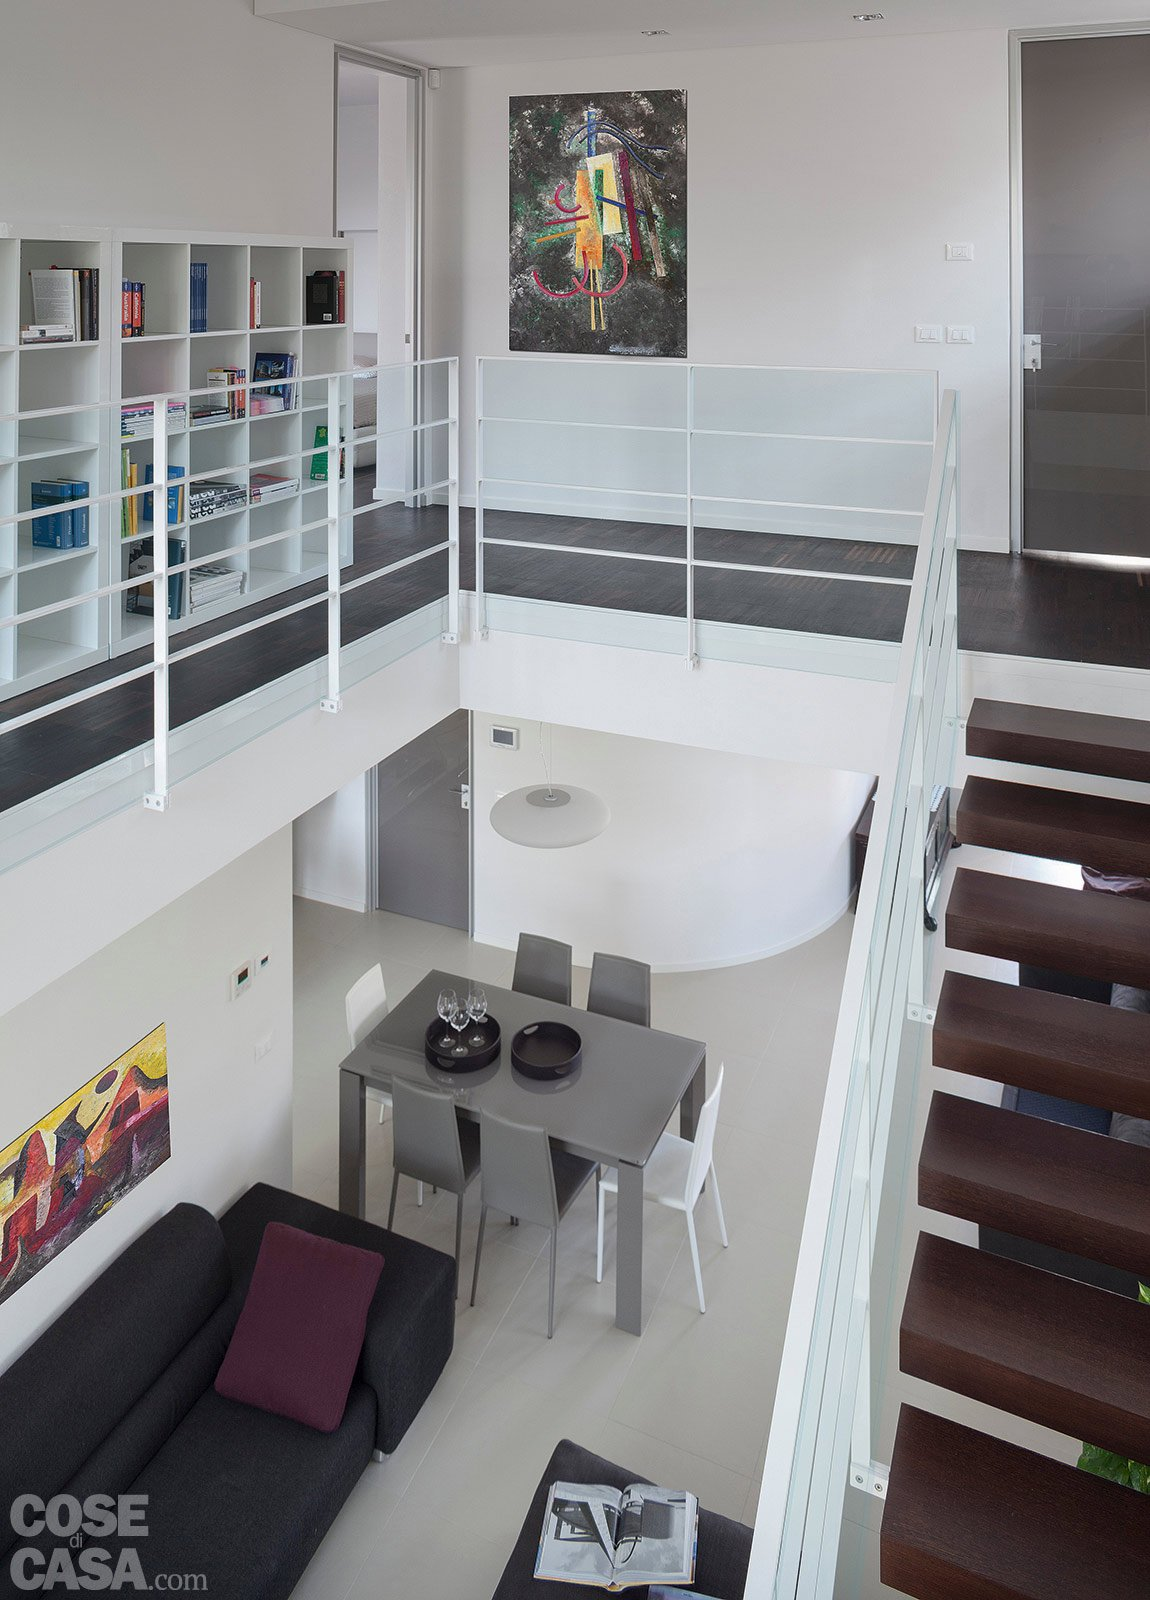 Architetture in piena luce cose di casa for Moderni disegni di case a due piani